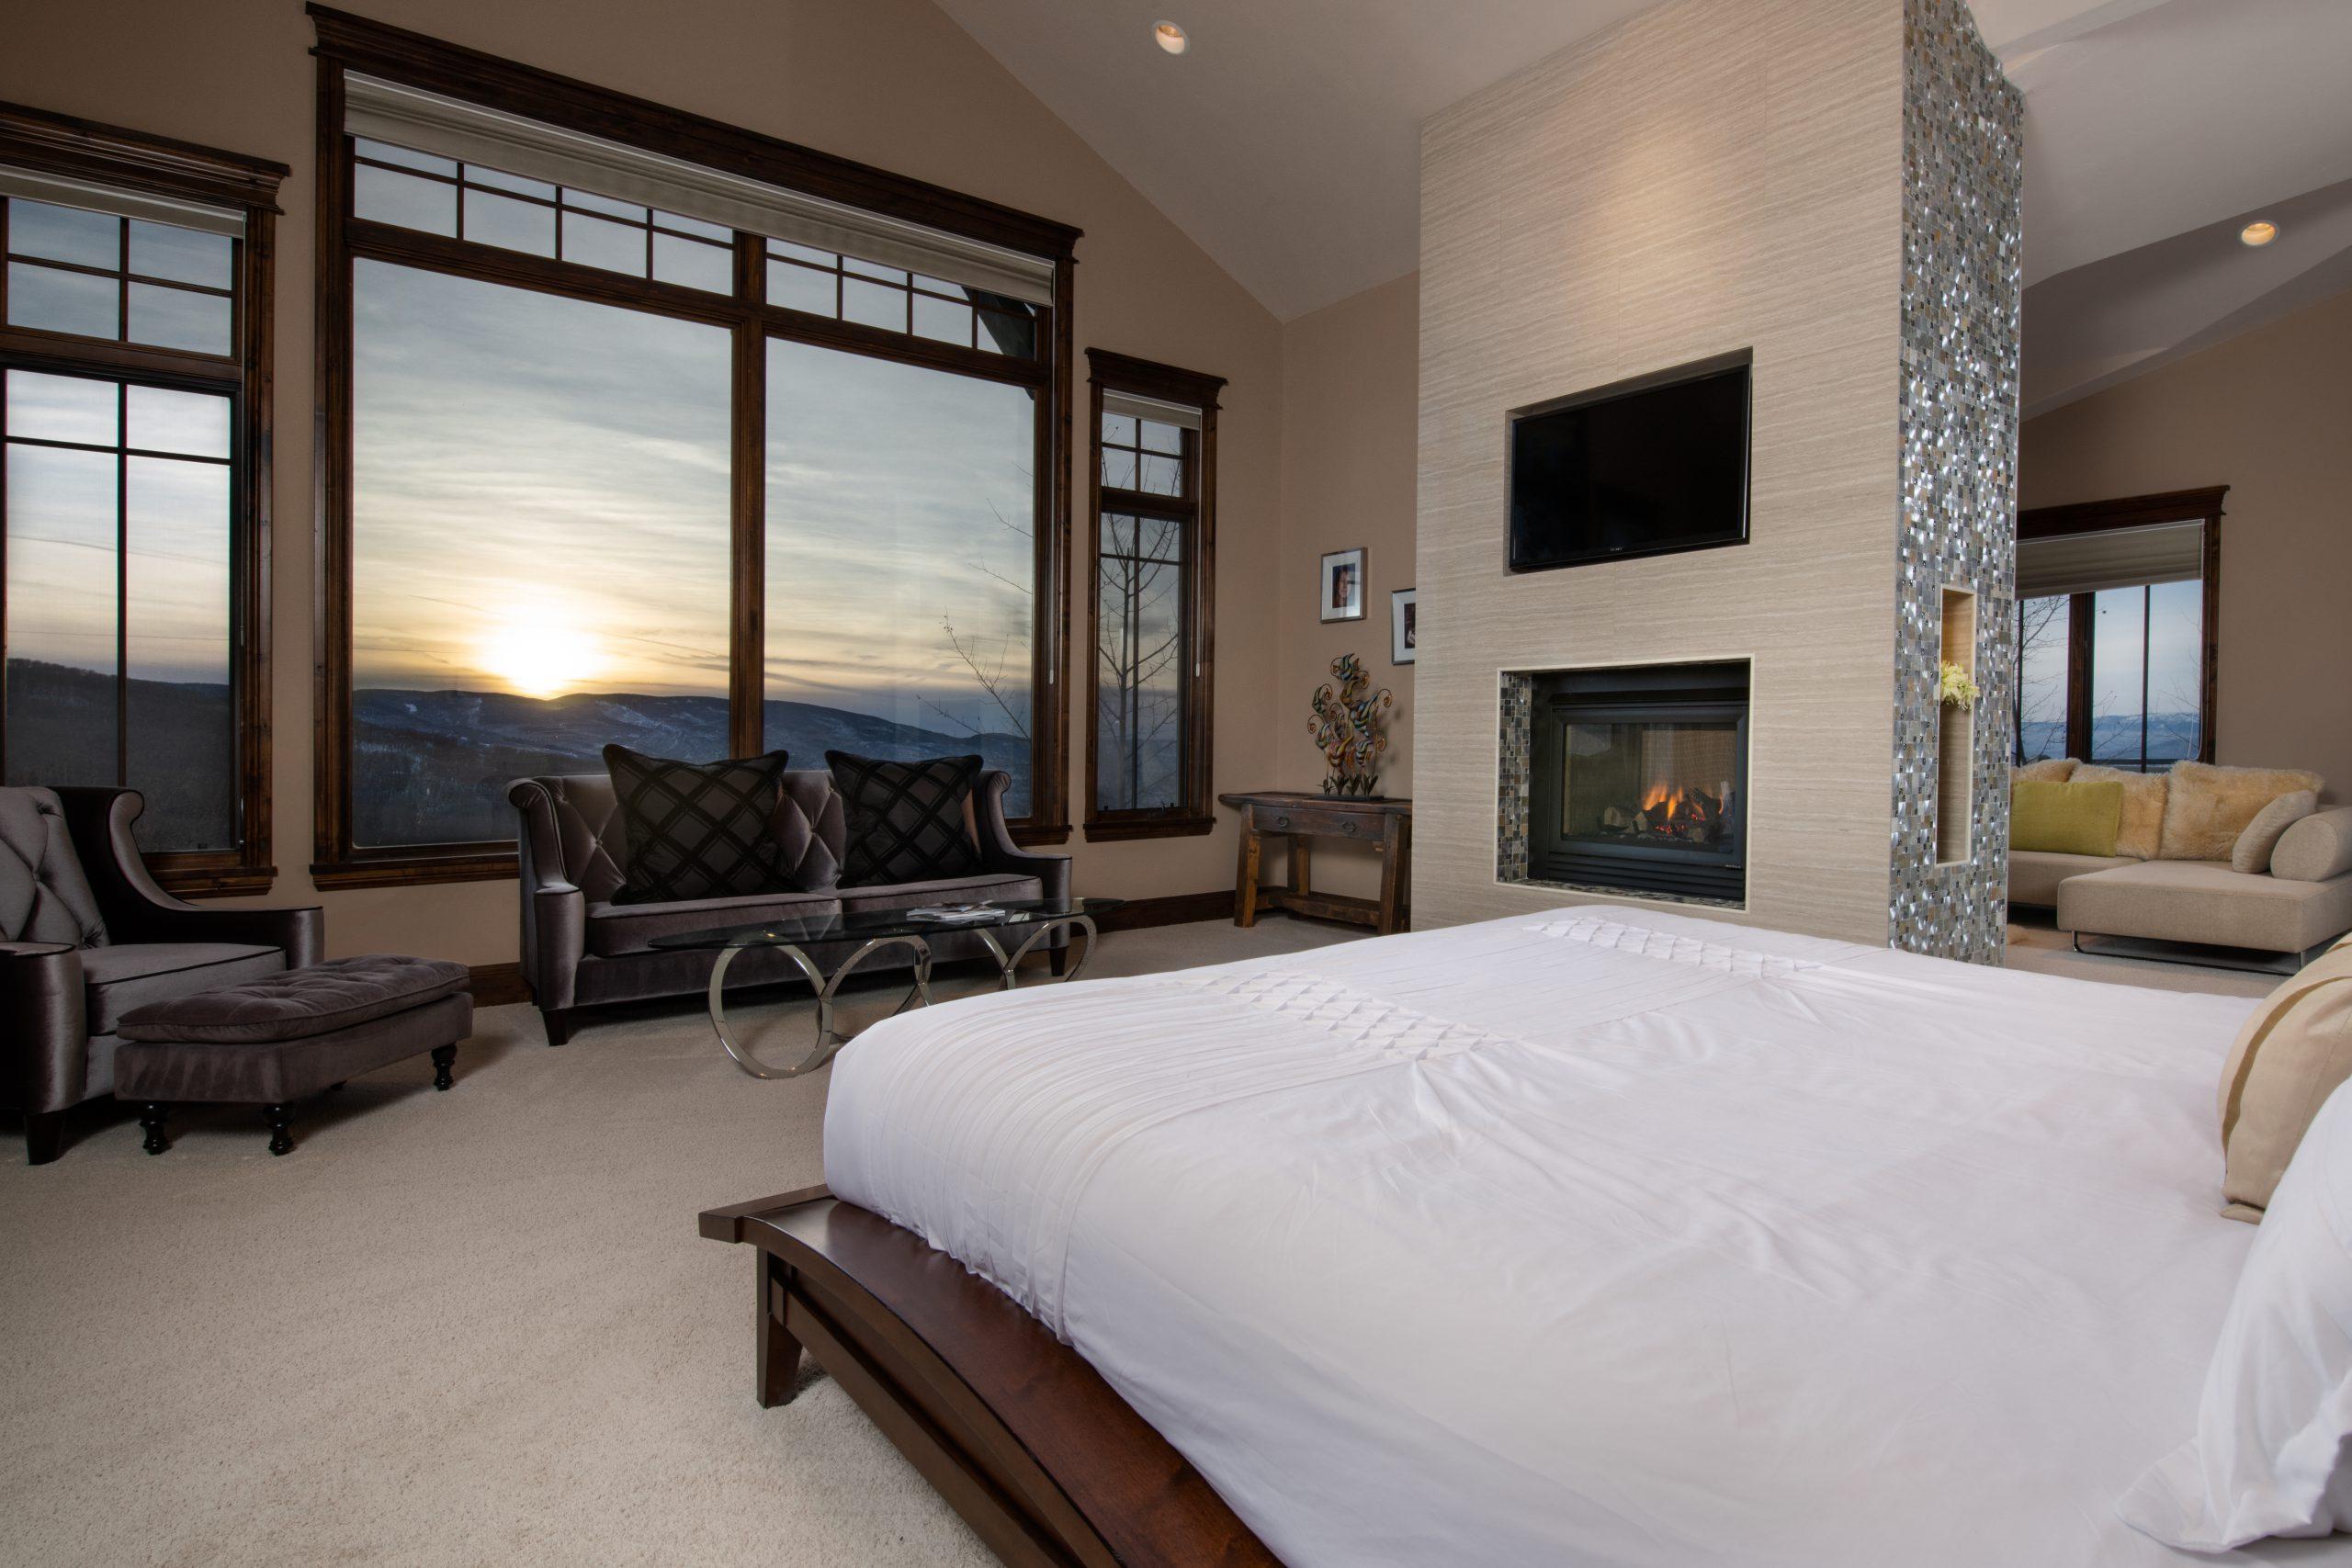 Bedroom with Sunset Window